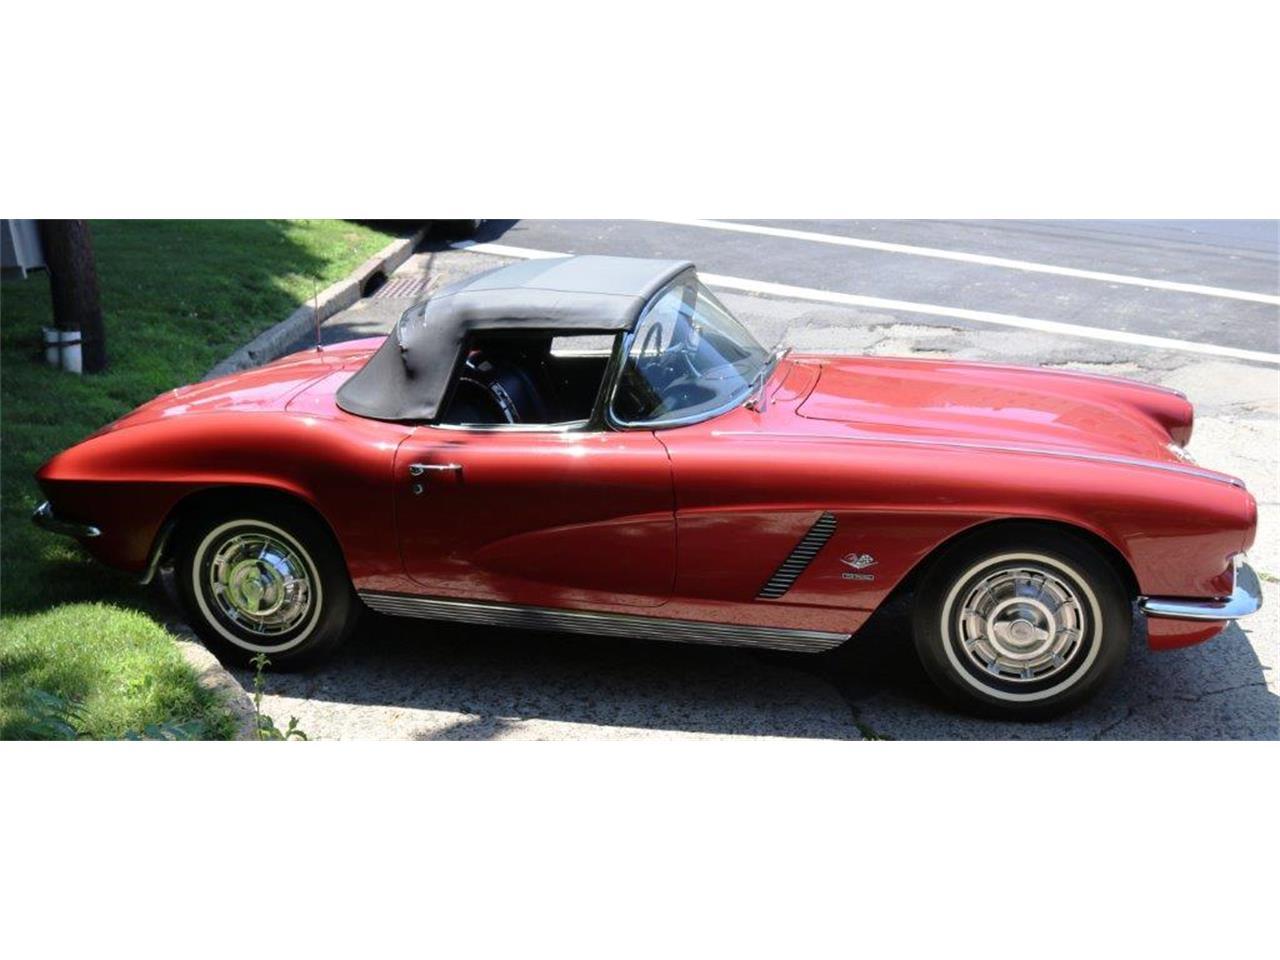 Large Picture of Classic '62 Chevrolet Corvette - $99,000.00 - OMBK